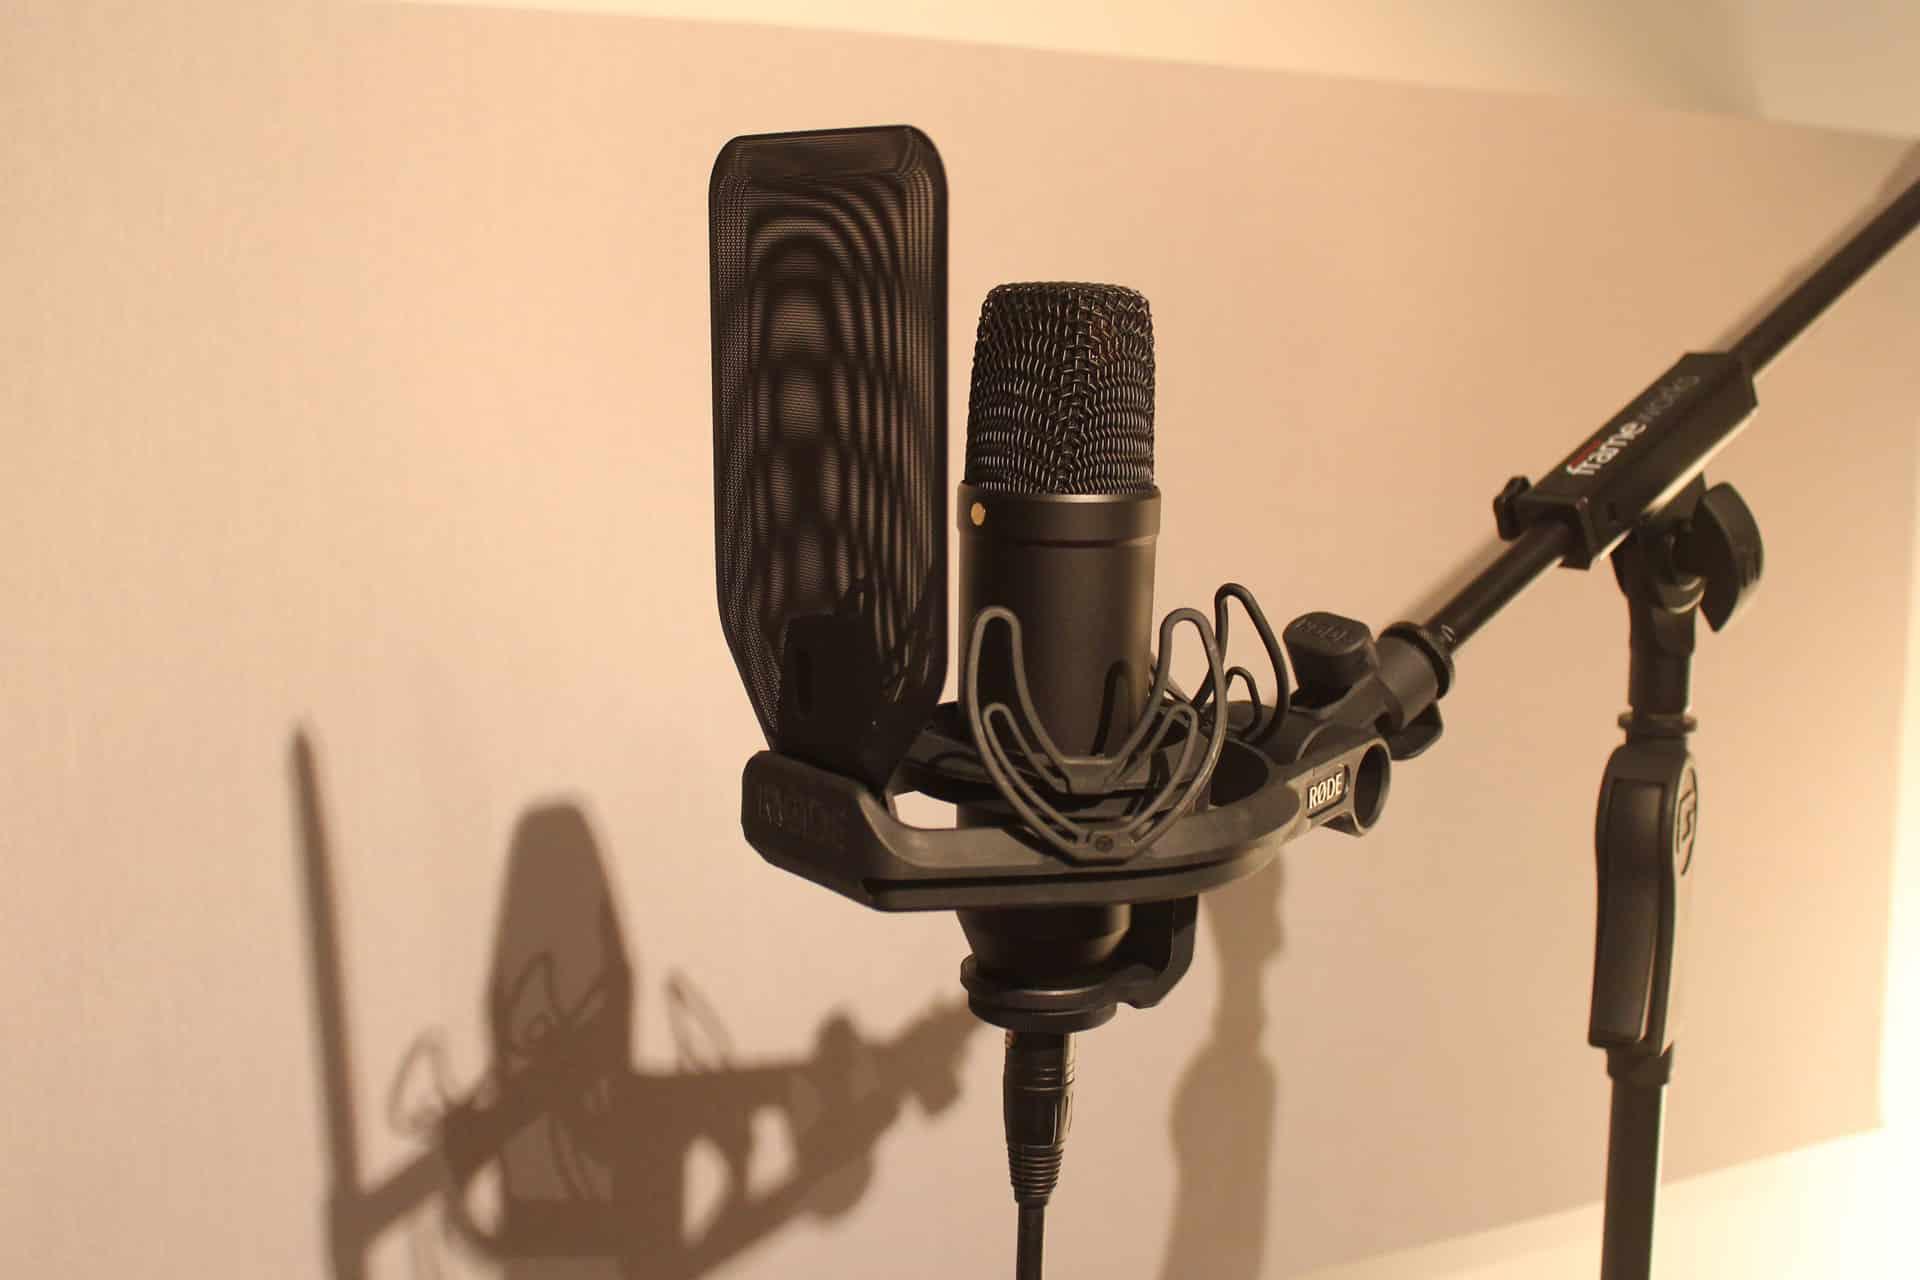 Le microphone a un design soigné